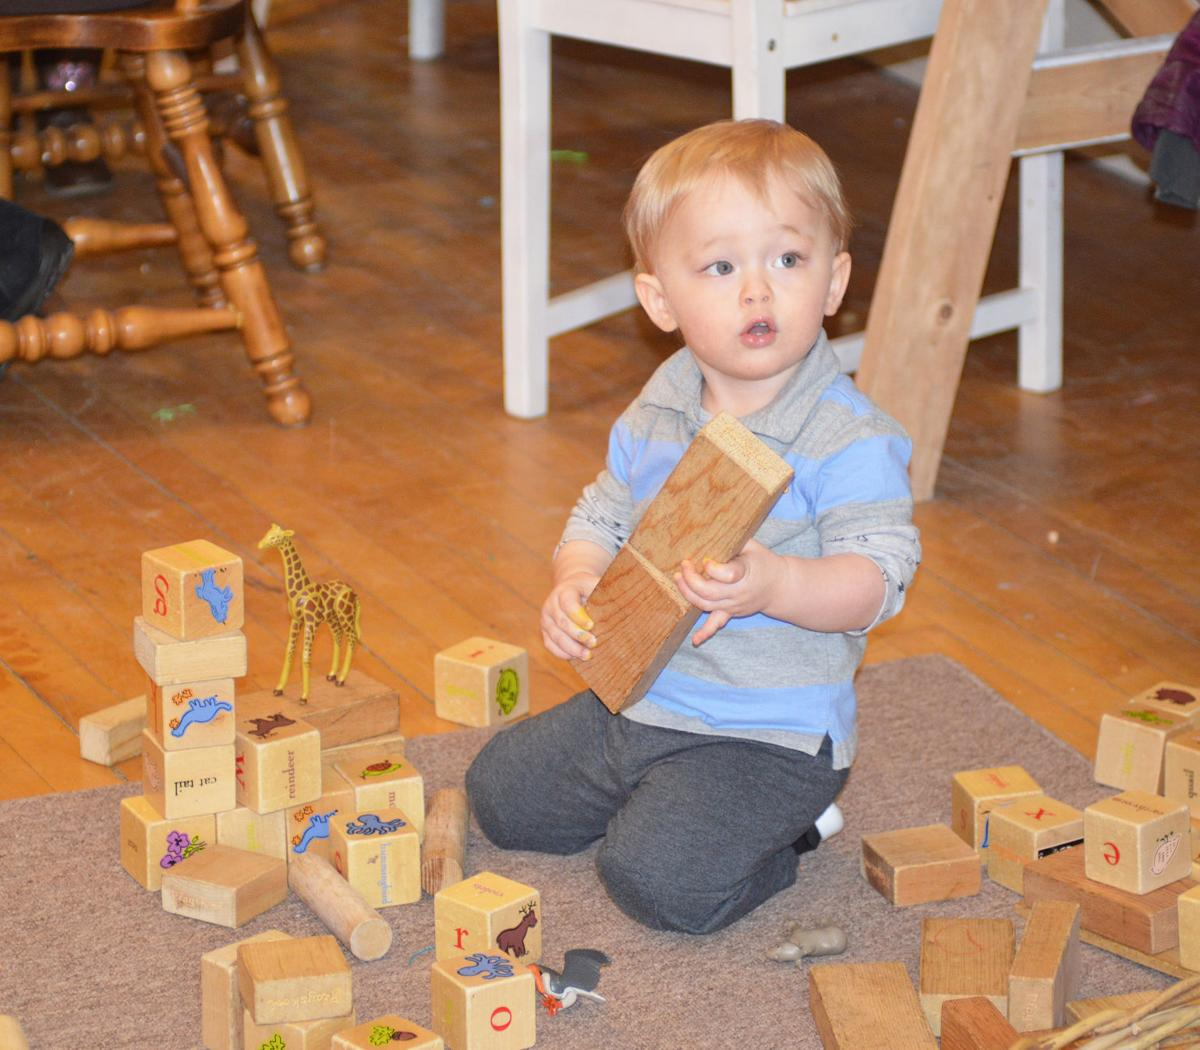 031718-jrnl-news-creative-kids-1